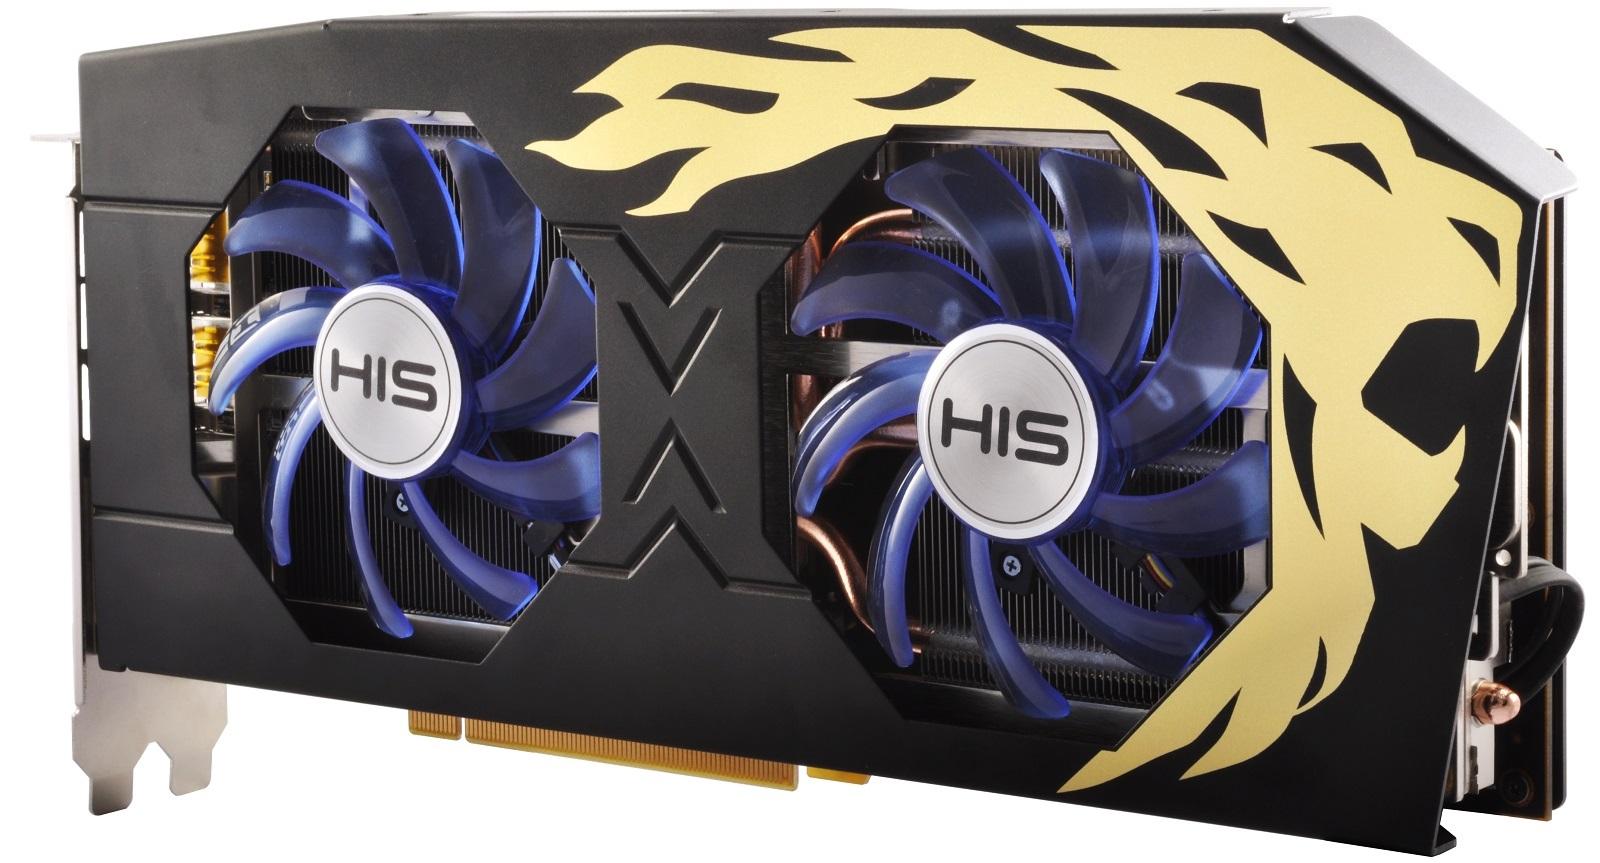 Radeon RX 480 IceQX2 Roaring (1)